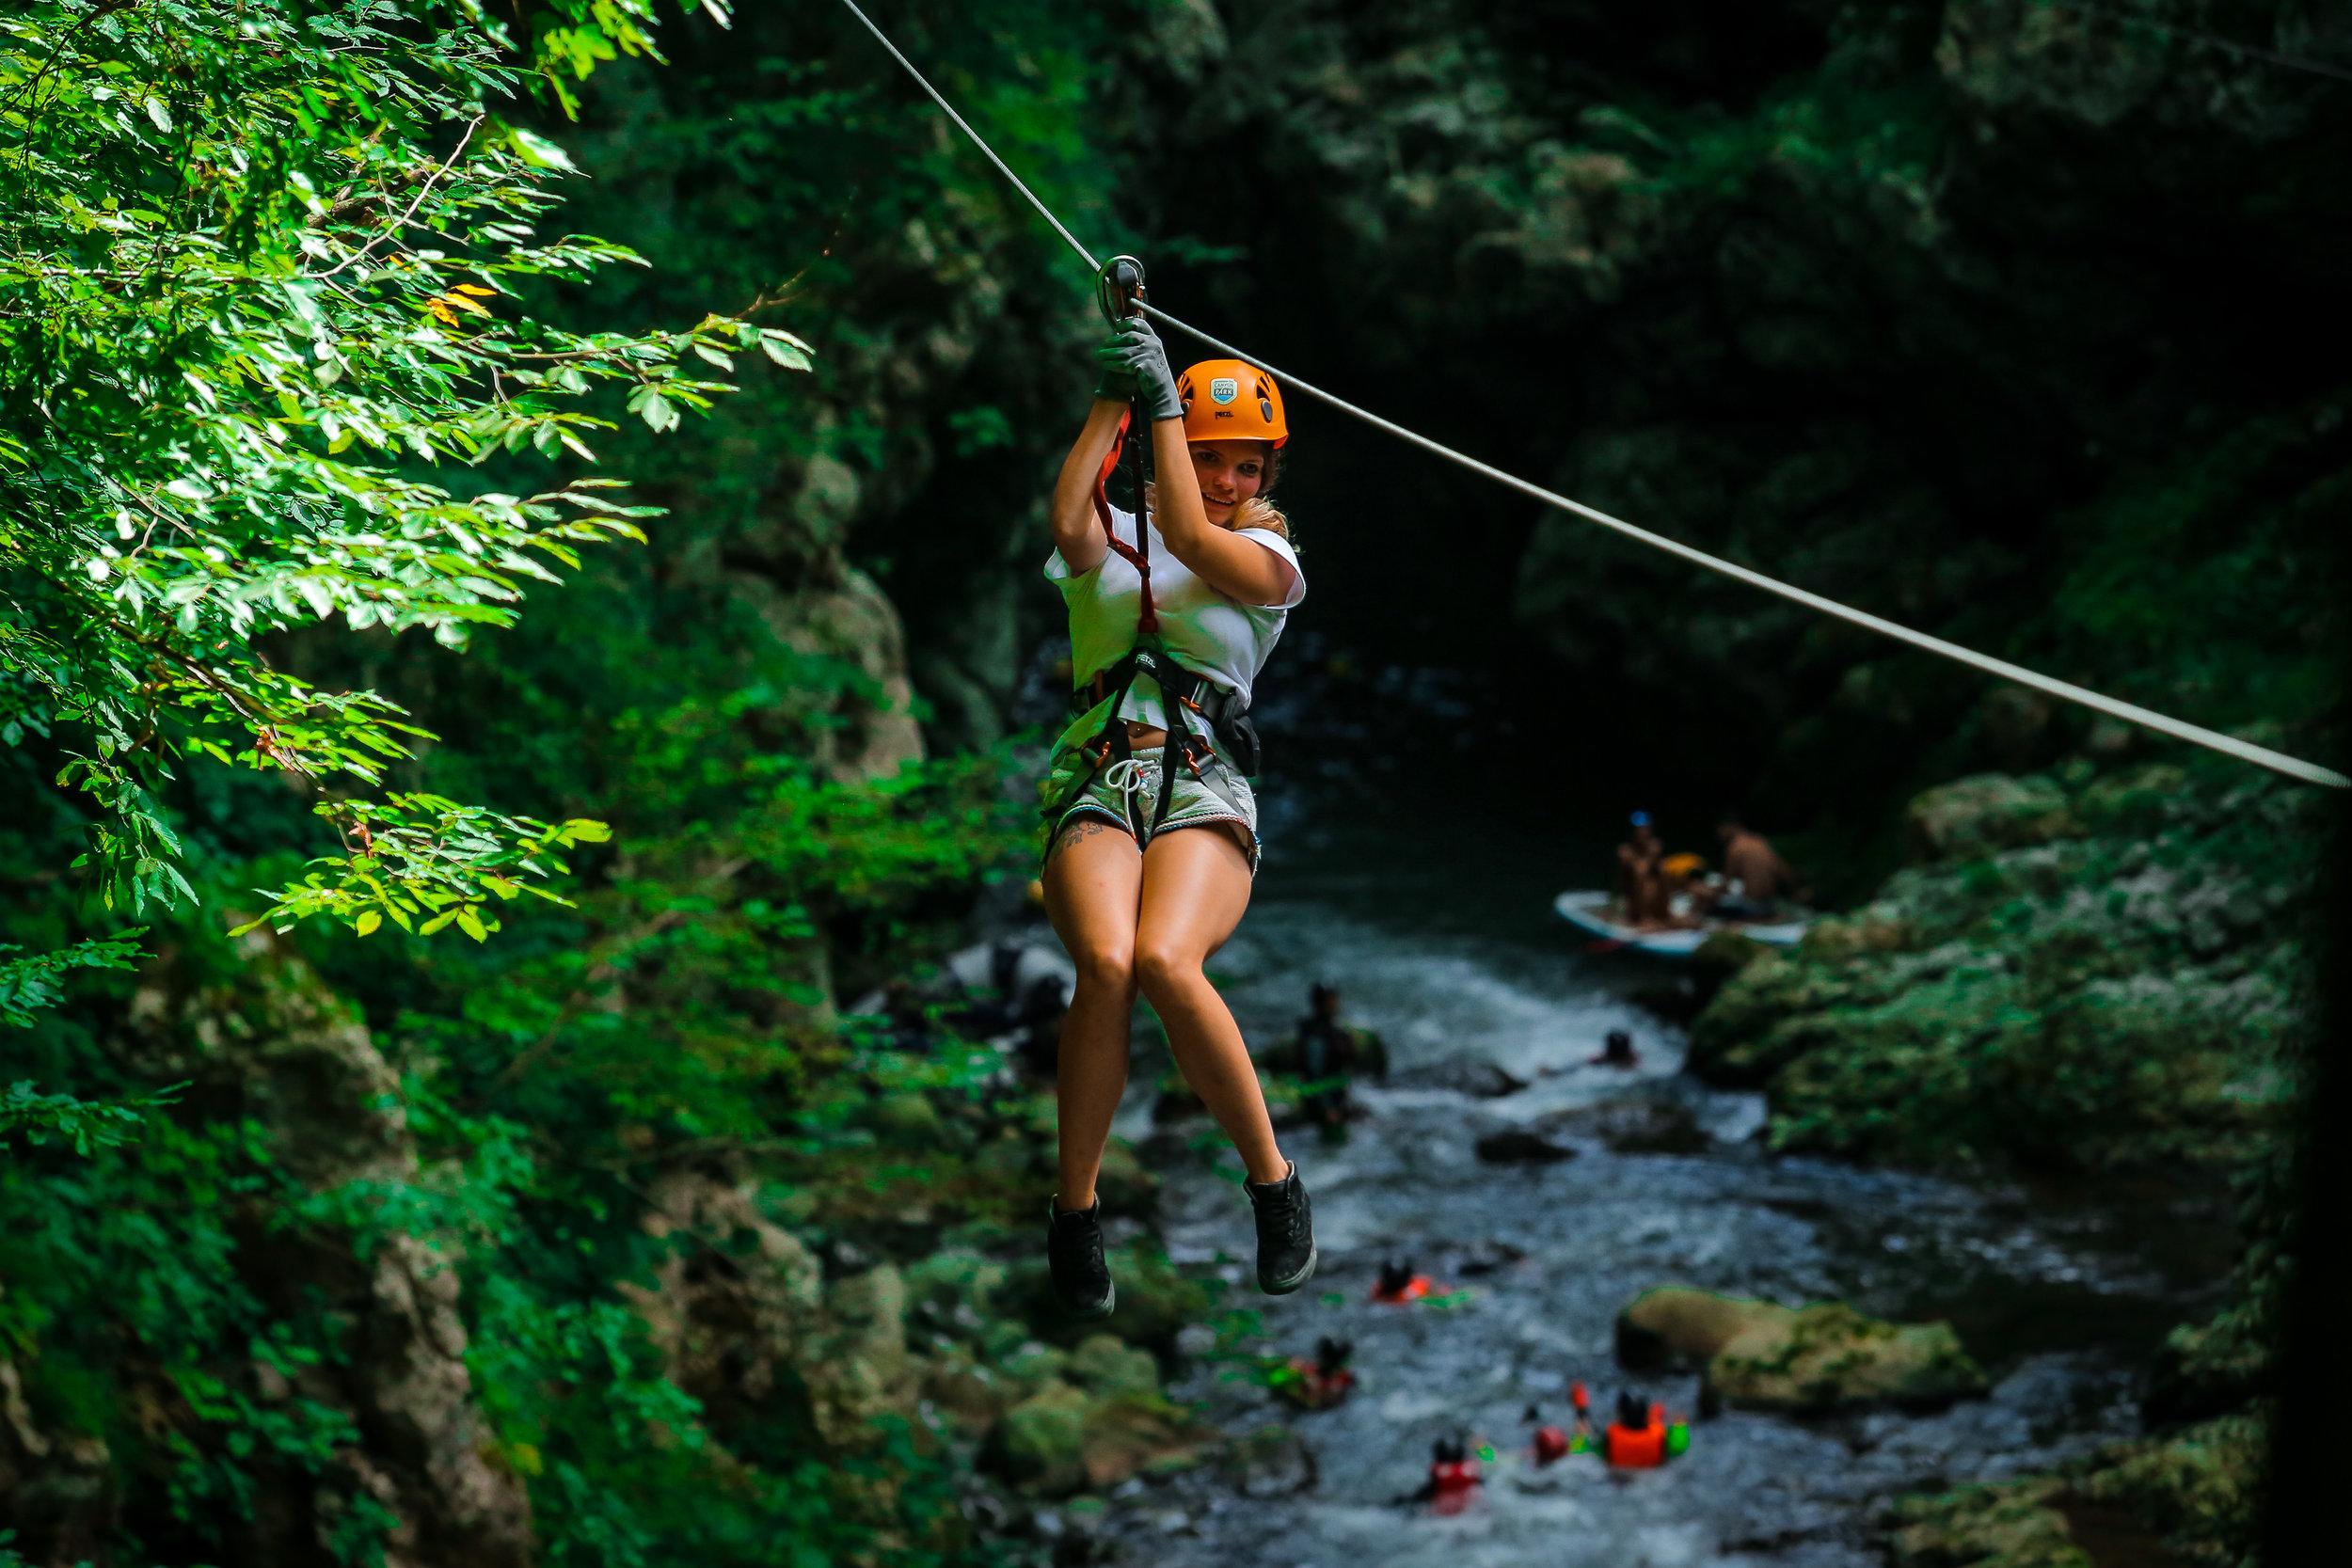 Canyon Adventure Park